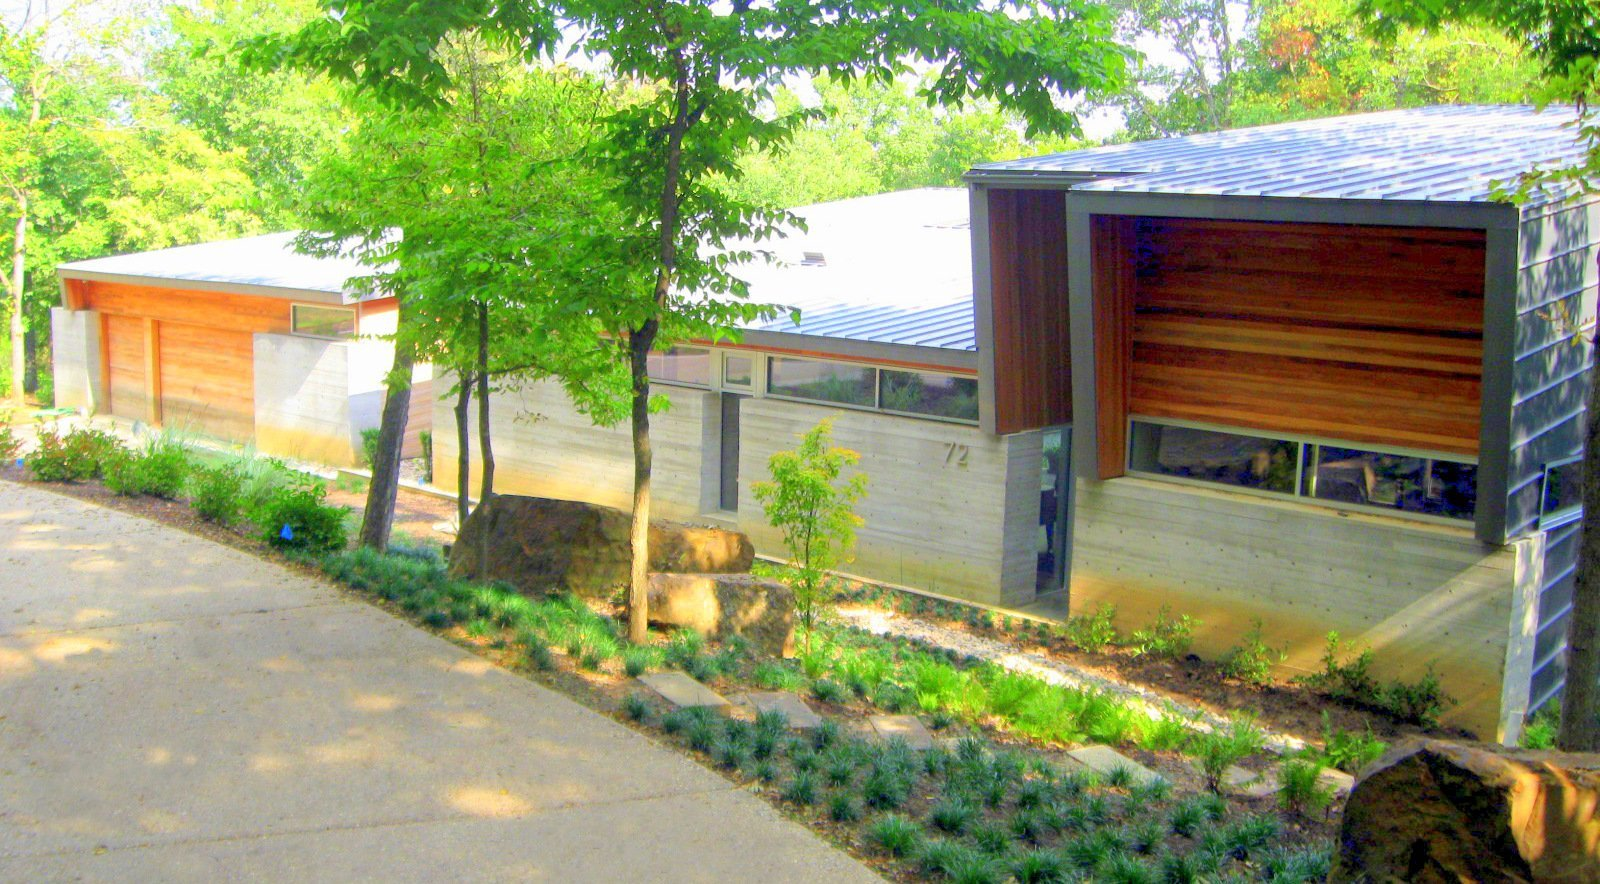 kestral harscape design residential